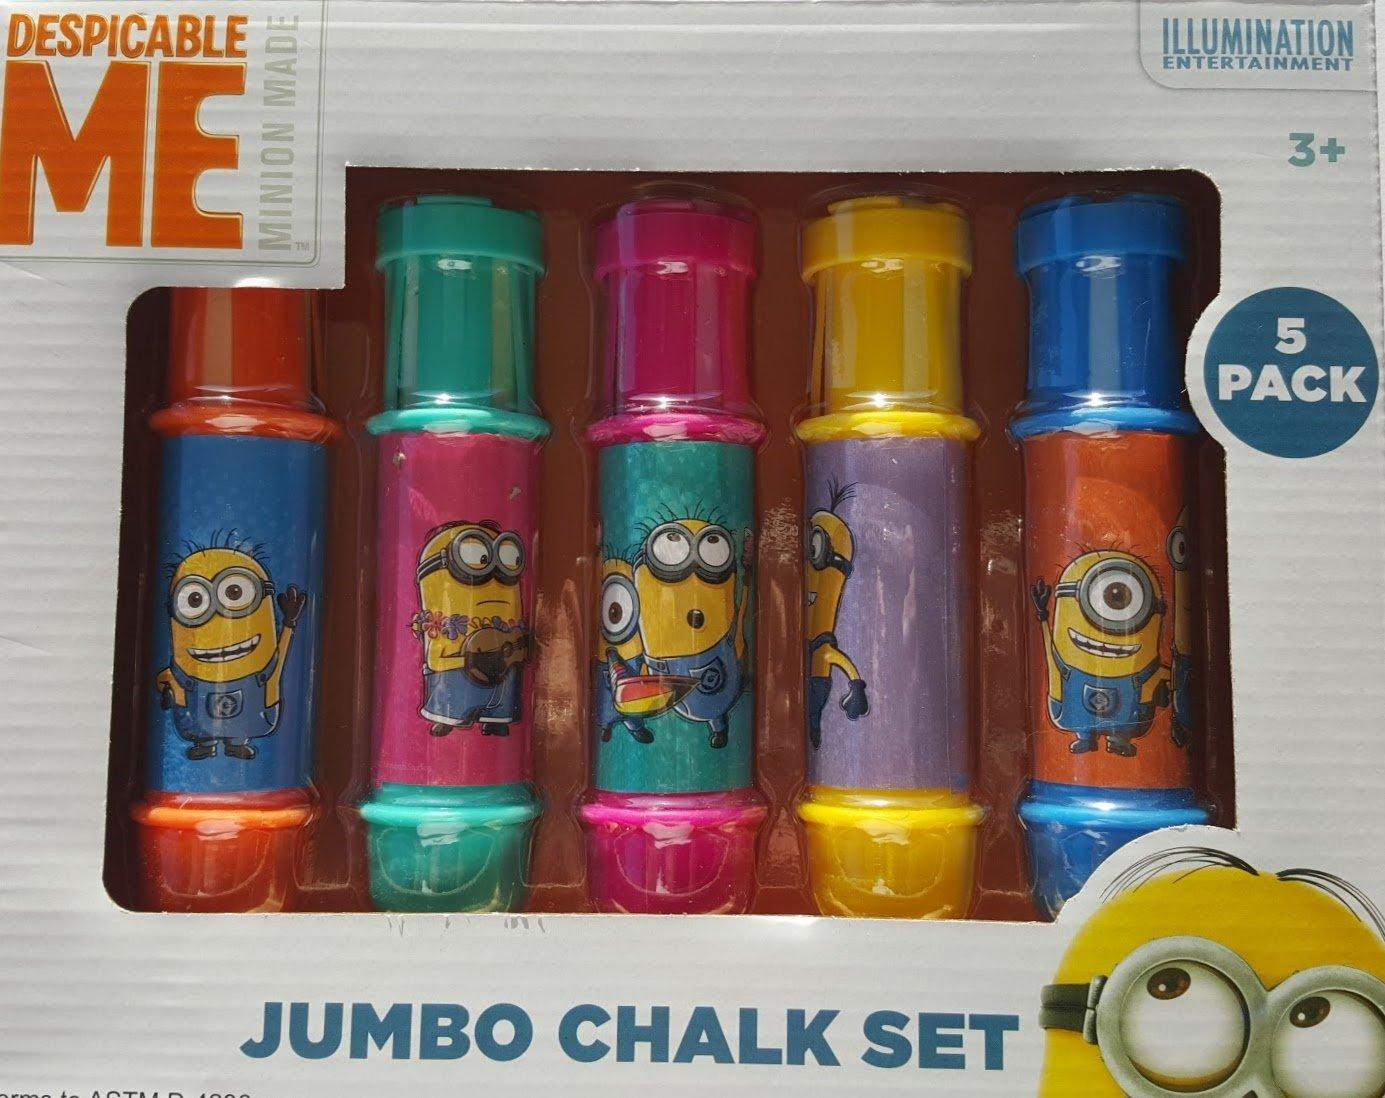 Despicable Me Minion 5 PC Jumbo Chalk Set Adjustable Draw and Play